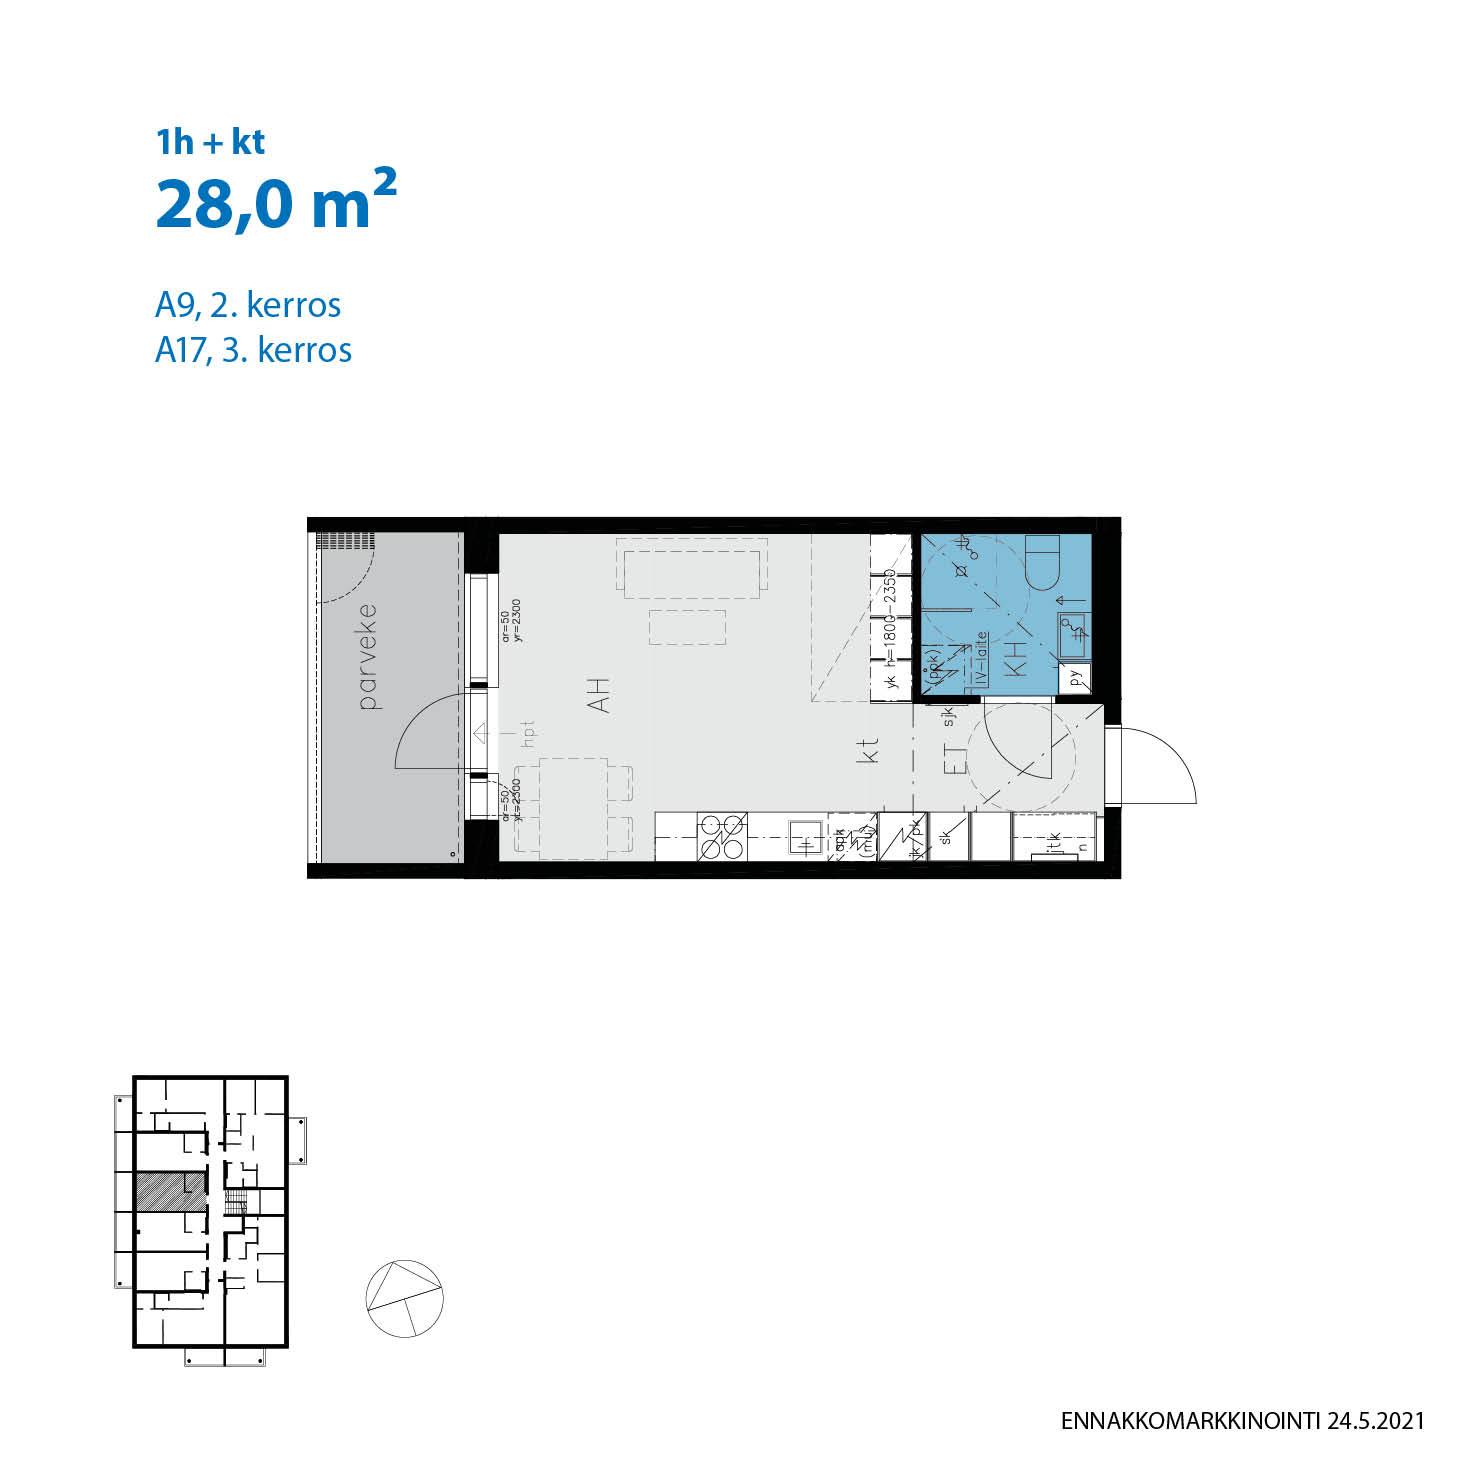 Asunto Oy Turun Gränsbackan Volter - Pryssinkatu 12, 20320, Turku - 1h+kt / 28.0m2